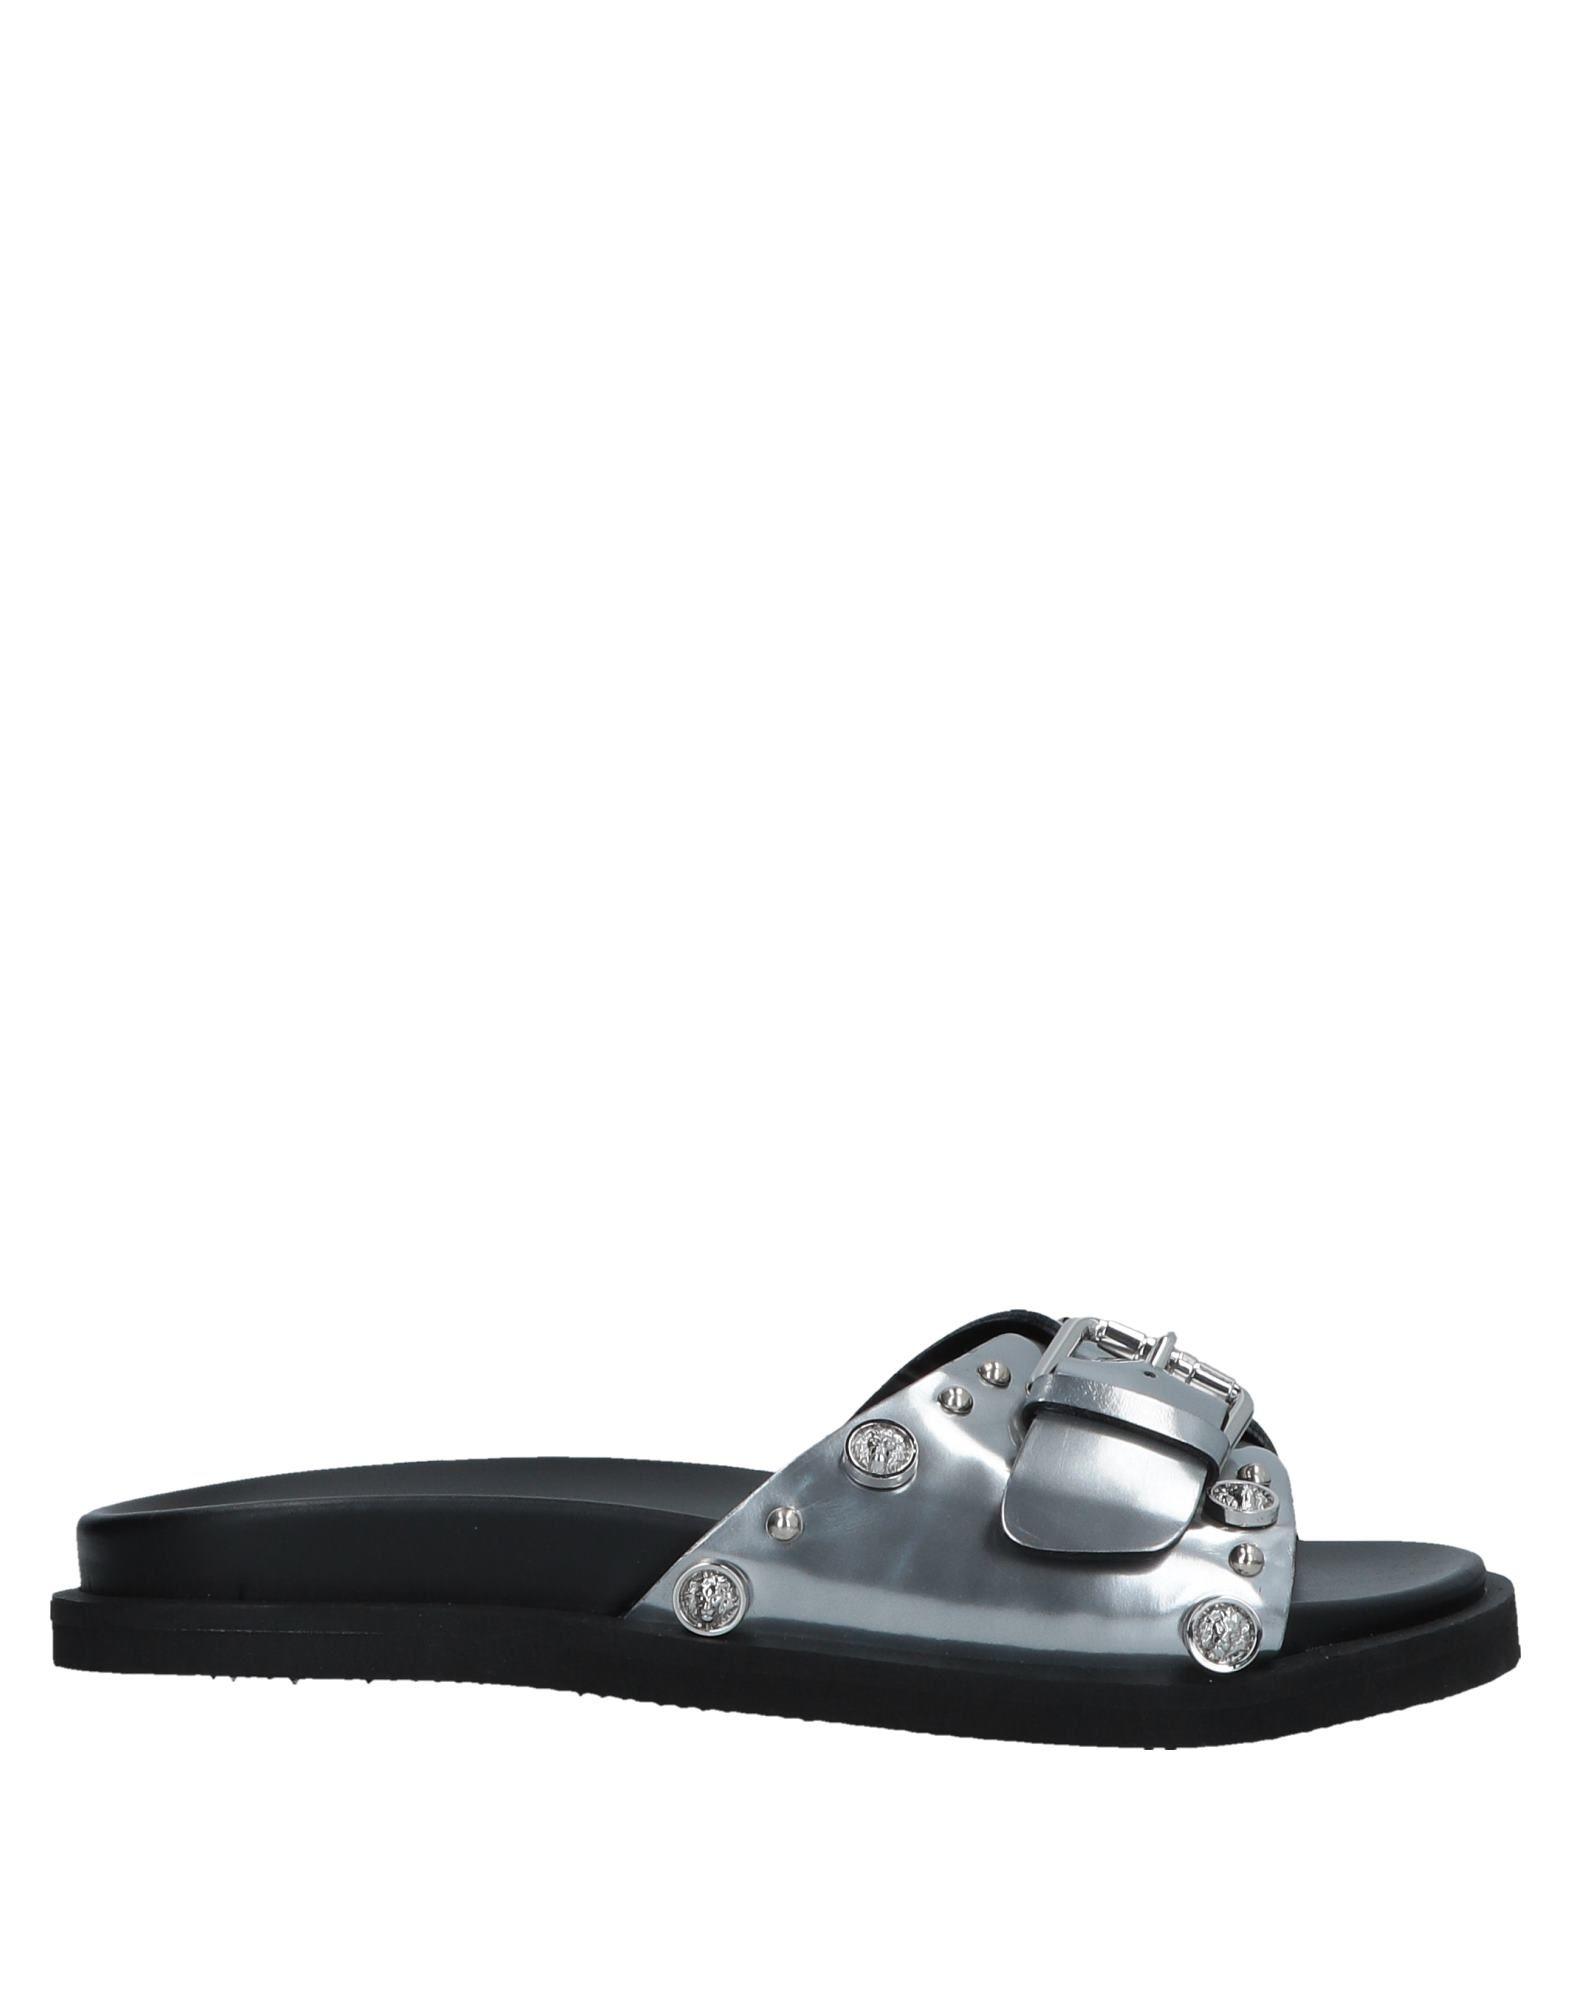 VERSUS VERSACE Домашние туфли versus versace домашние туфли